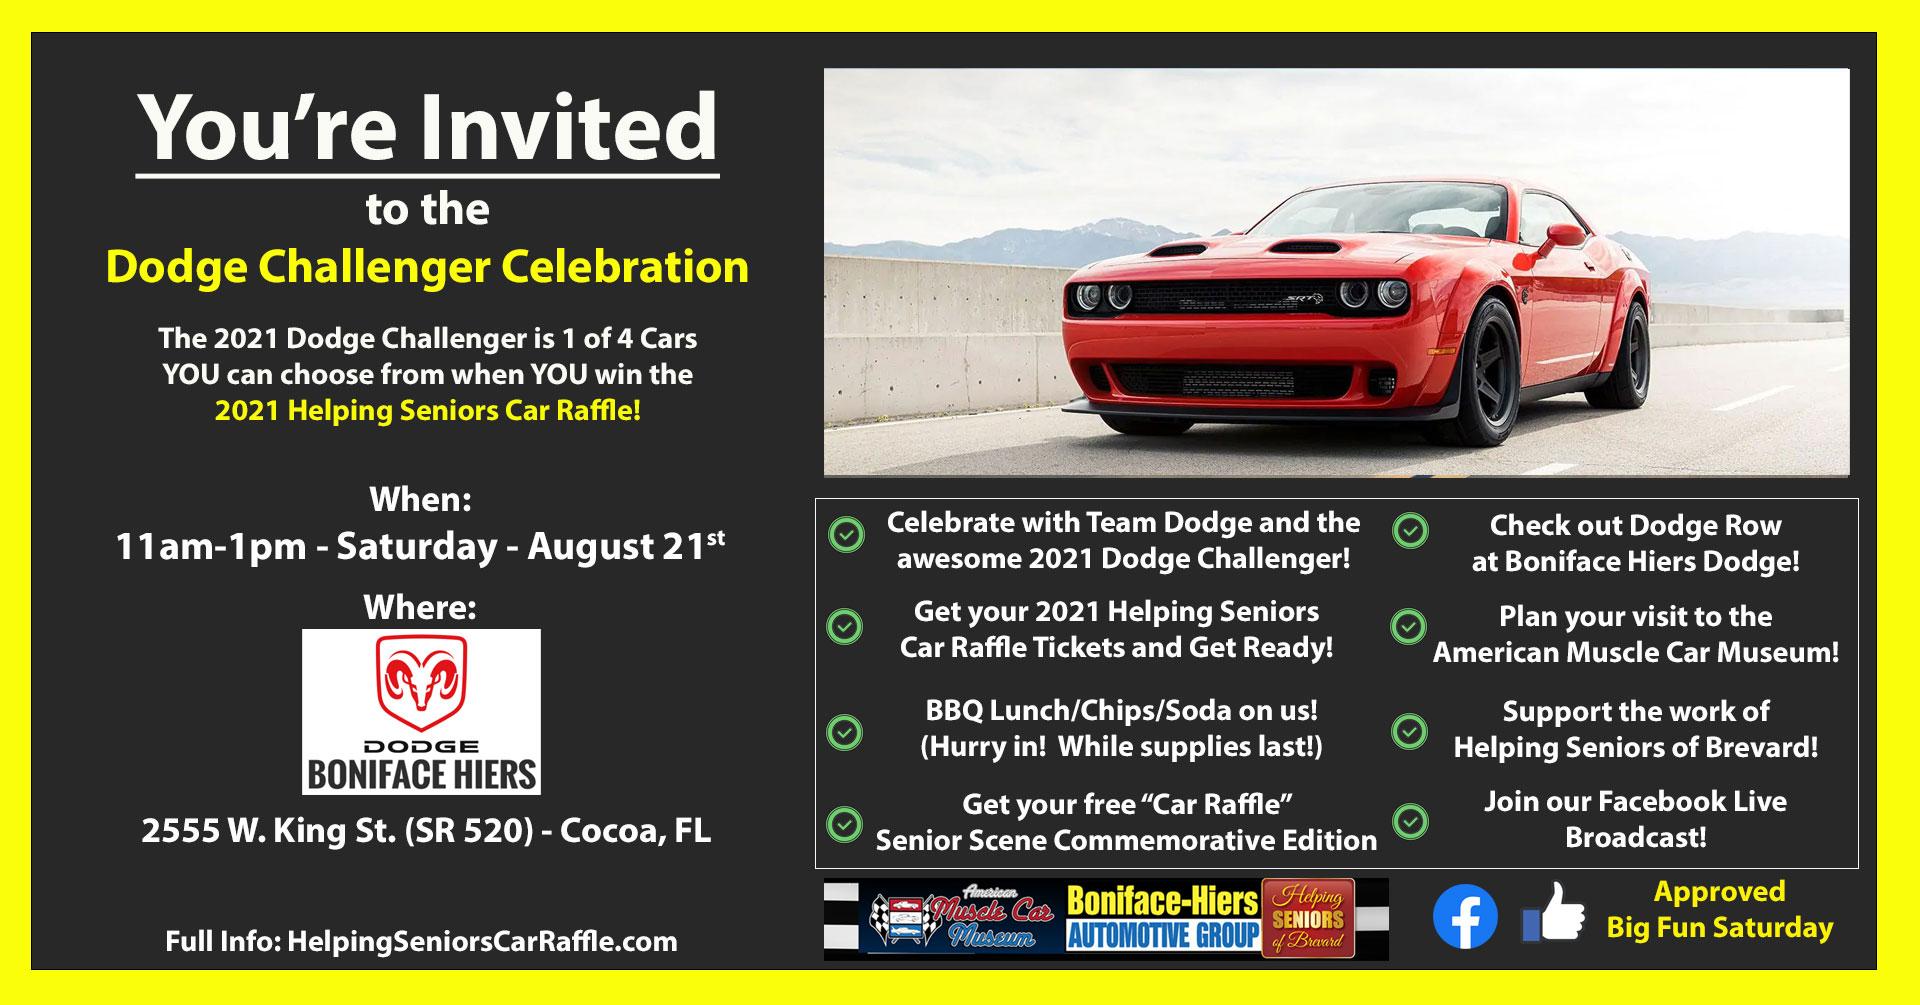 August 21st - Dodge Challenger Celebration